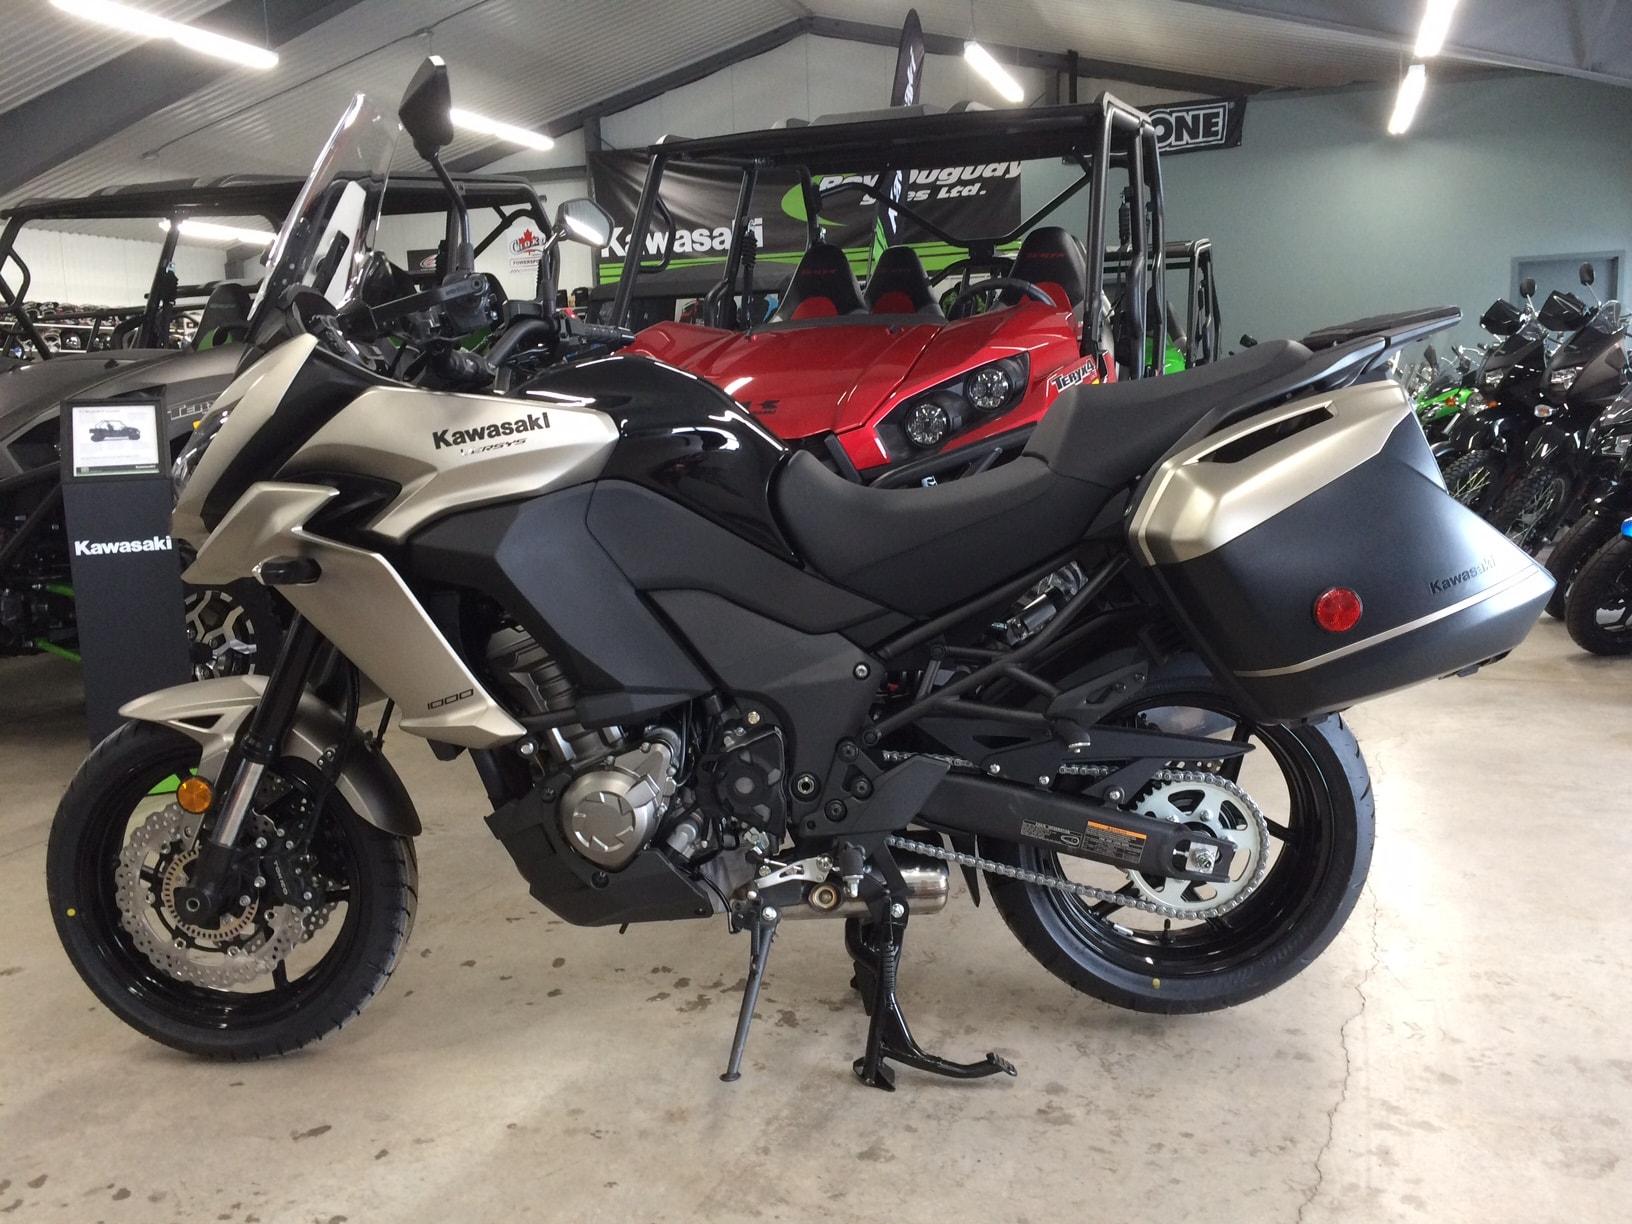 kawasaki versys 1000 2017 versys 1000 lt touring motorcycle by kawasaki versys 1000 grand. Black Bedroom Furniture Sets. Home Design Ideas